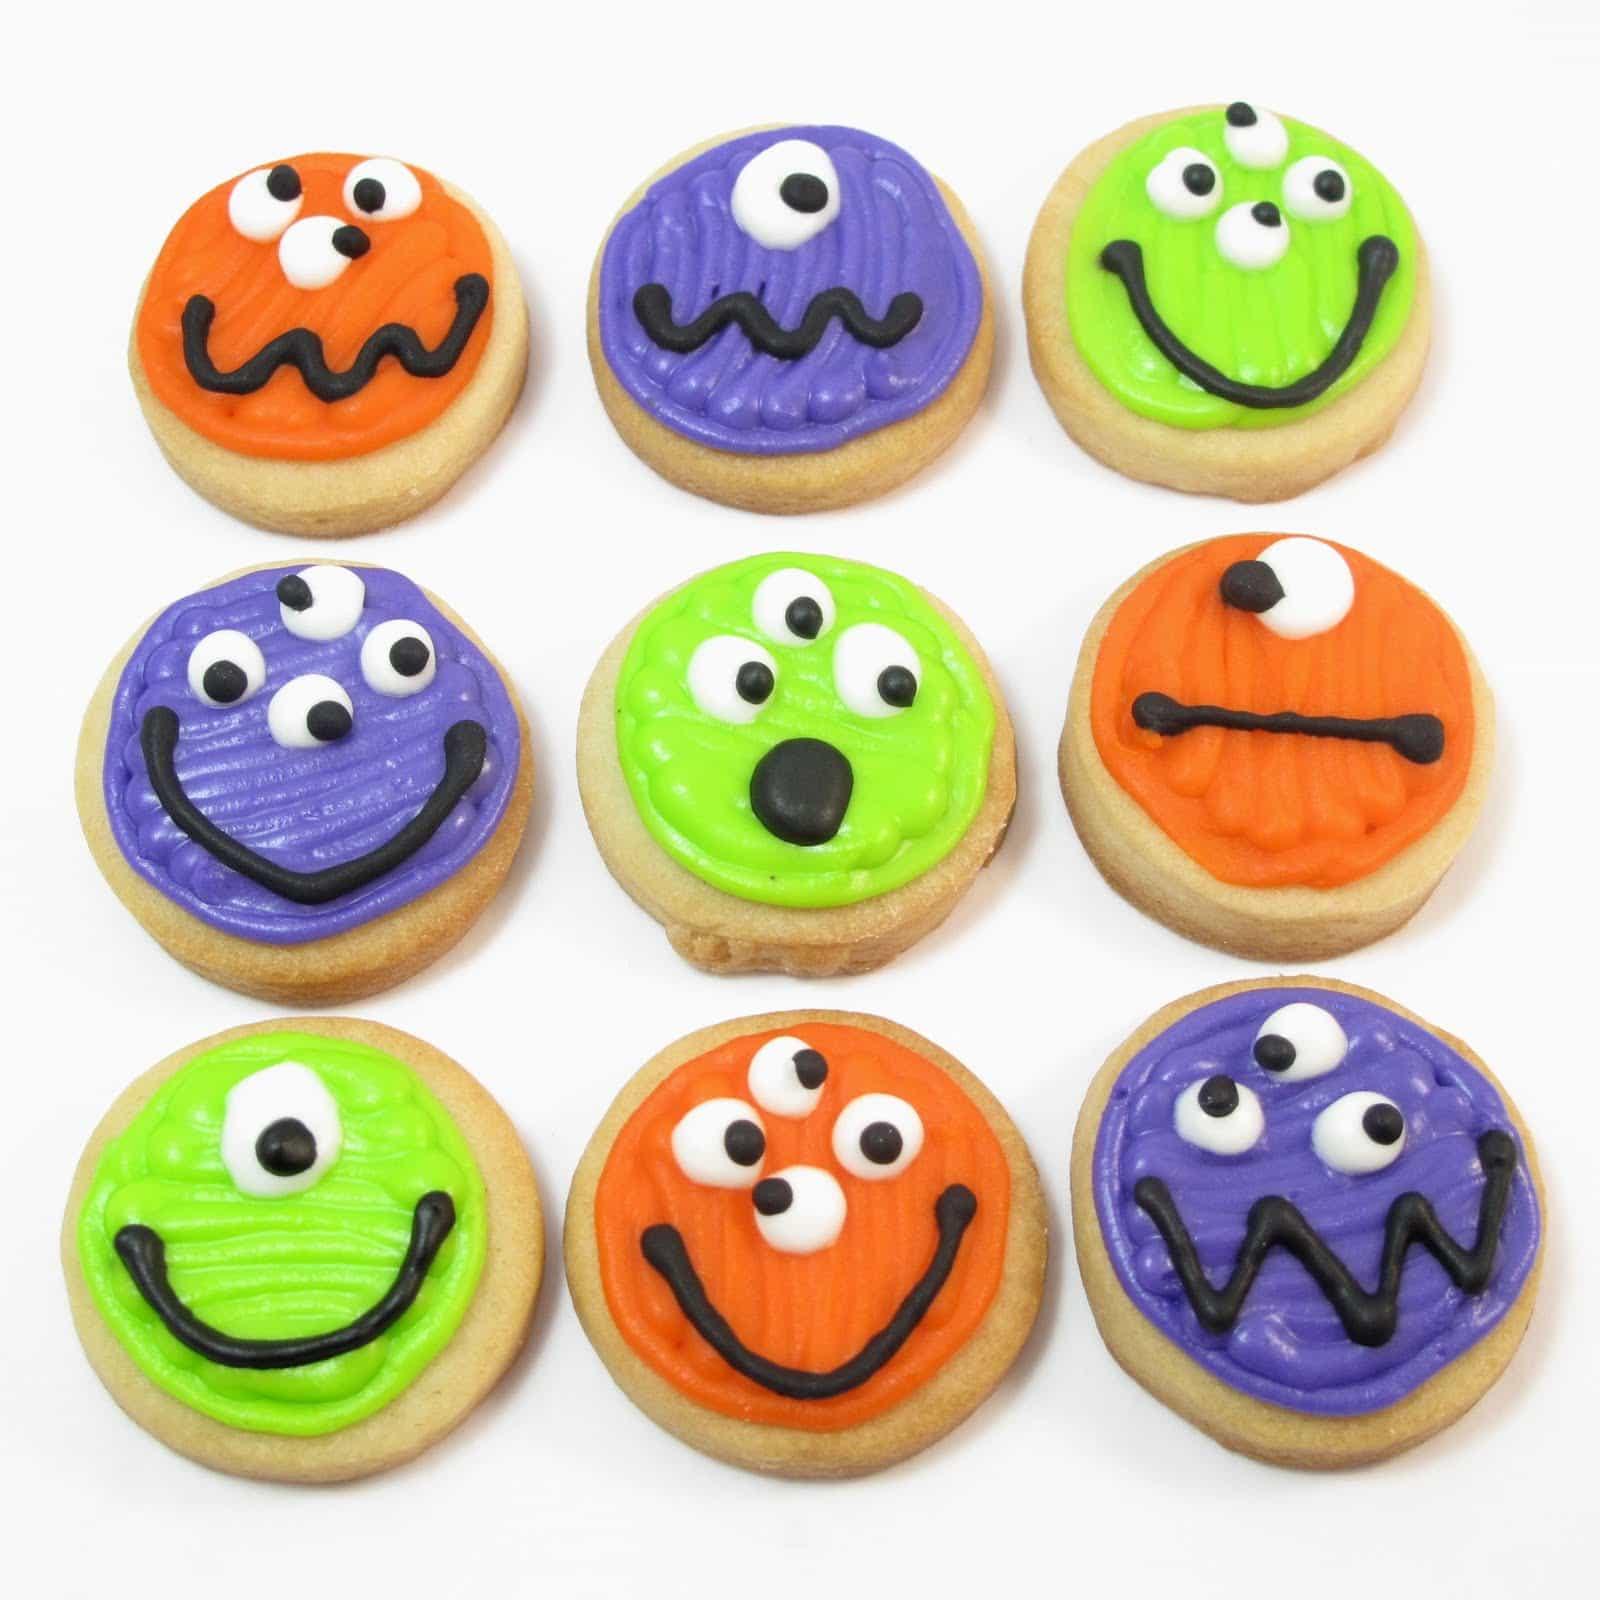 Cookie Monster Craft